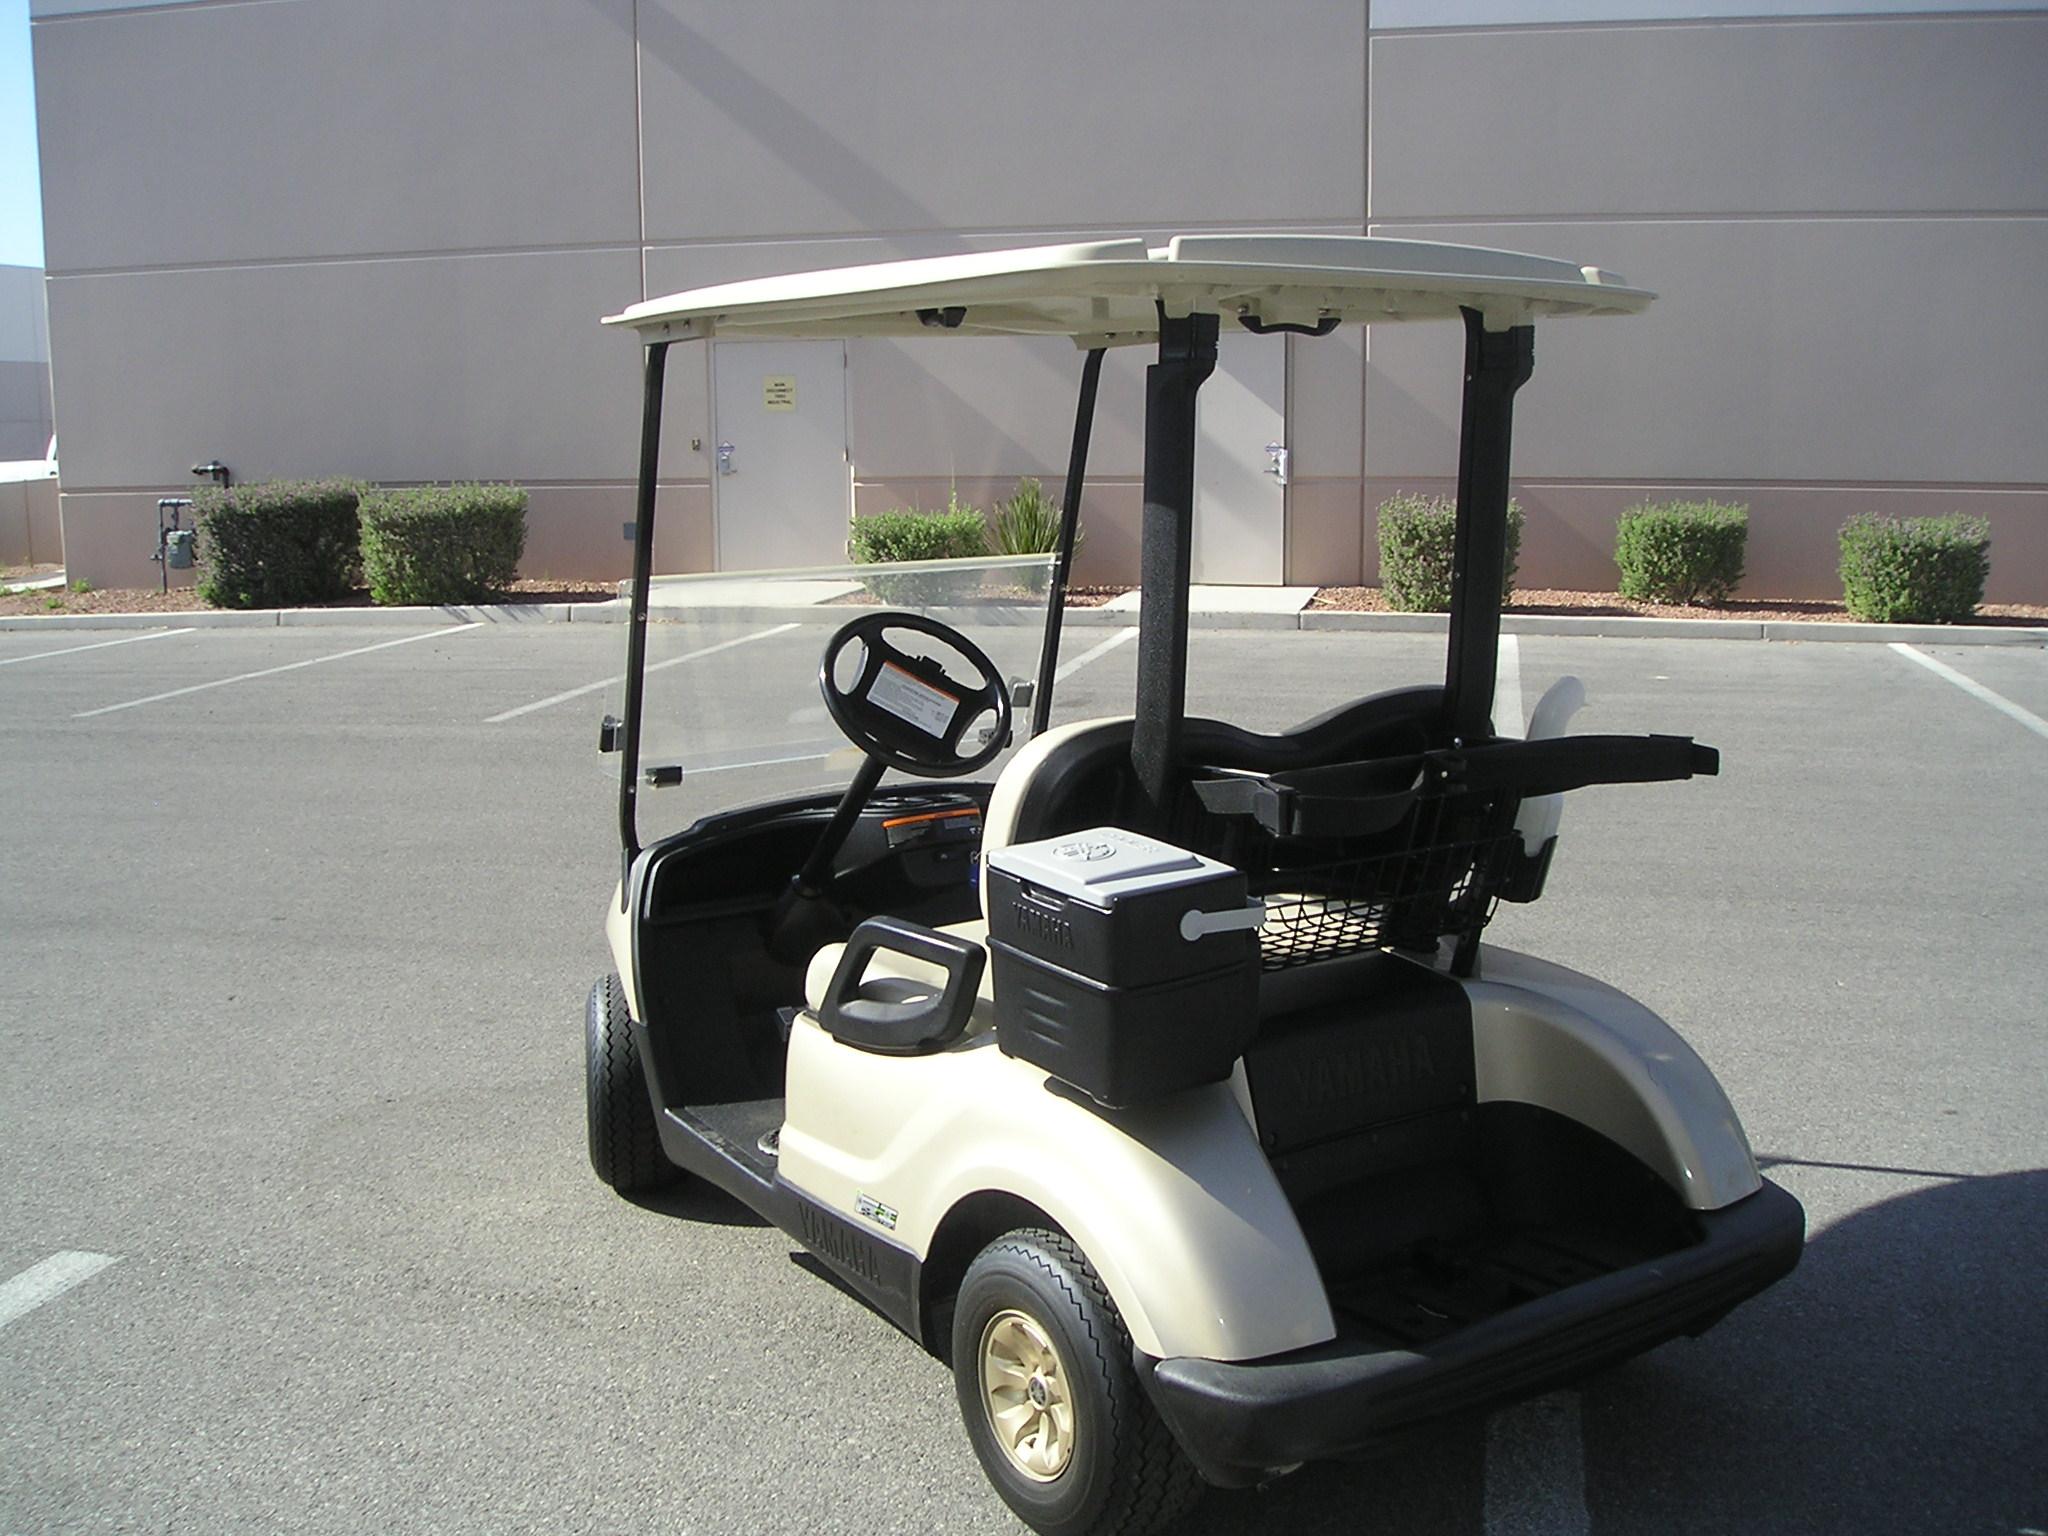 yamaha golf carts oklahoma hyundai sonata radio wiring diagram 2014 efi gas cart wheels in motion